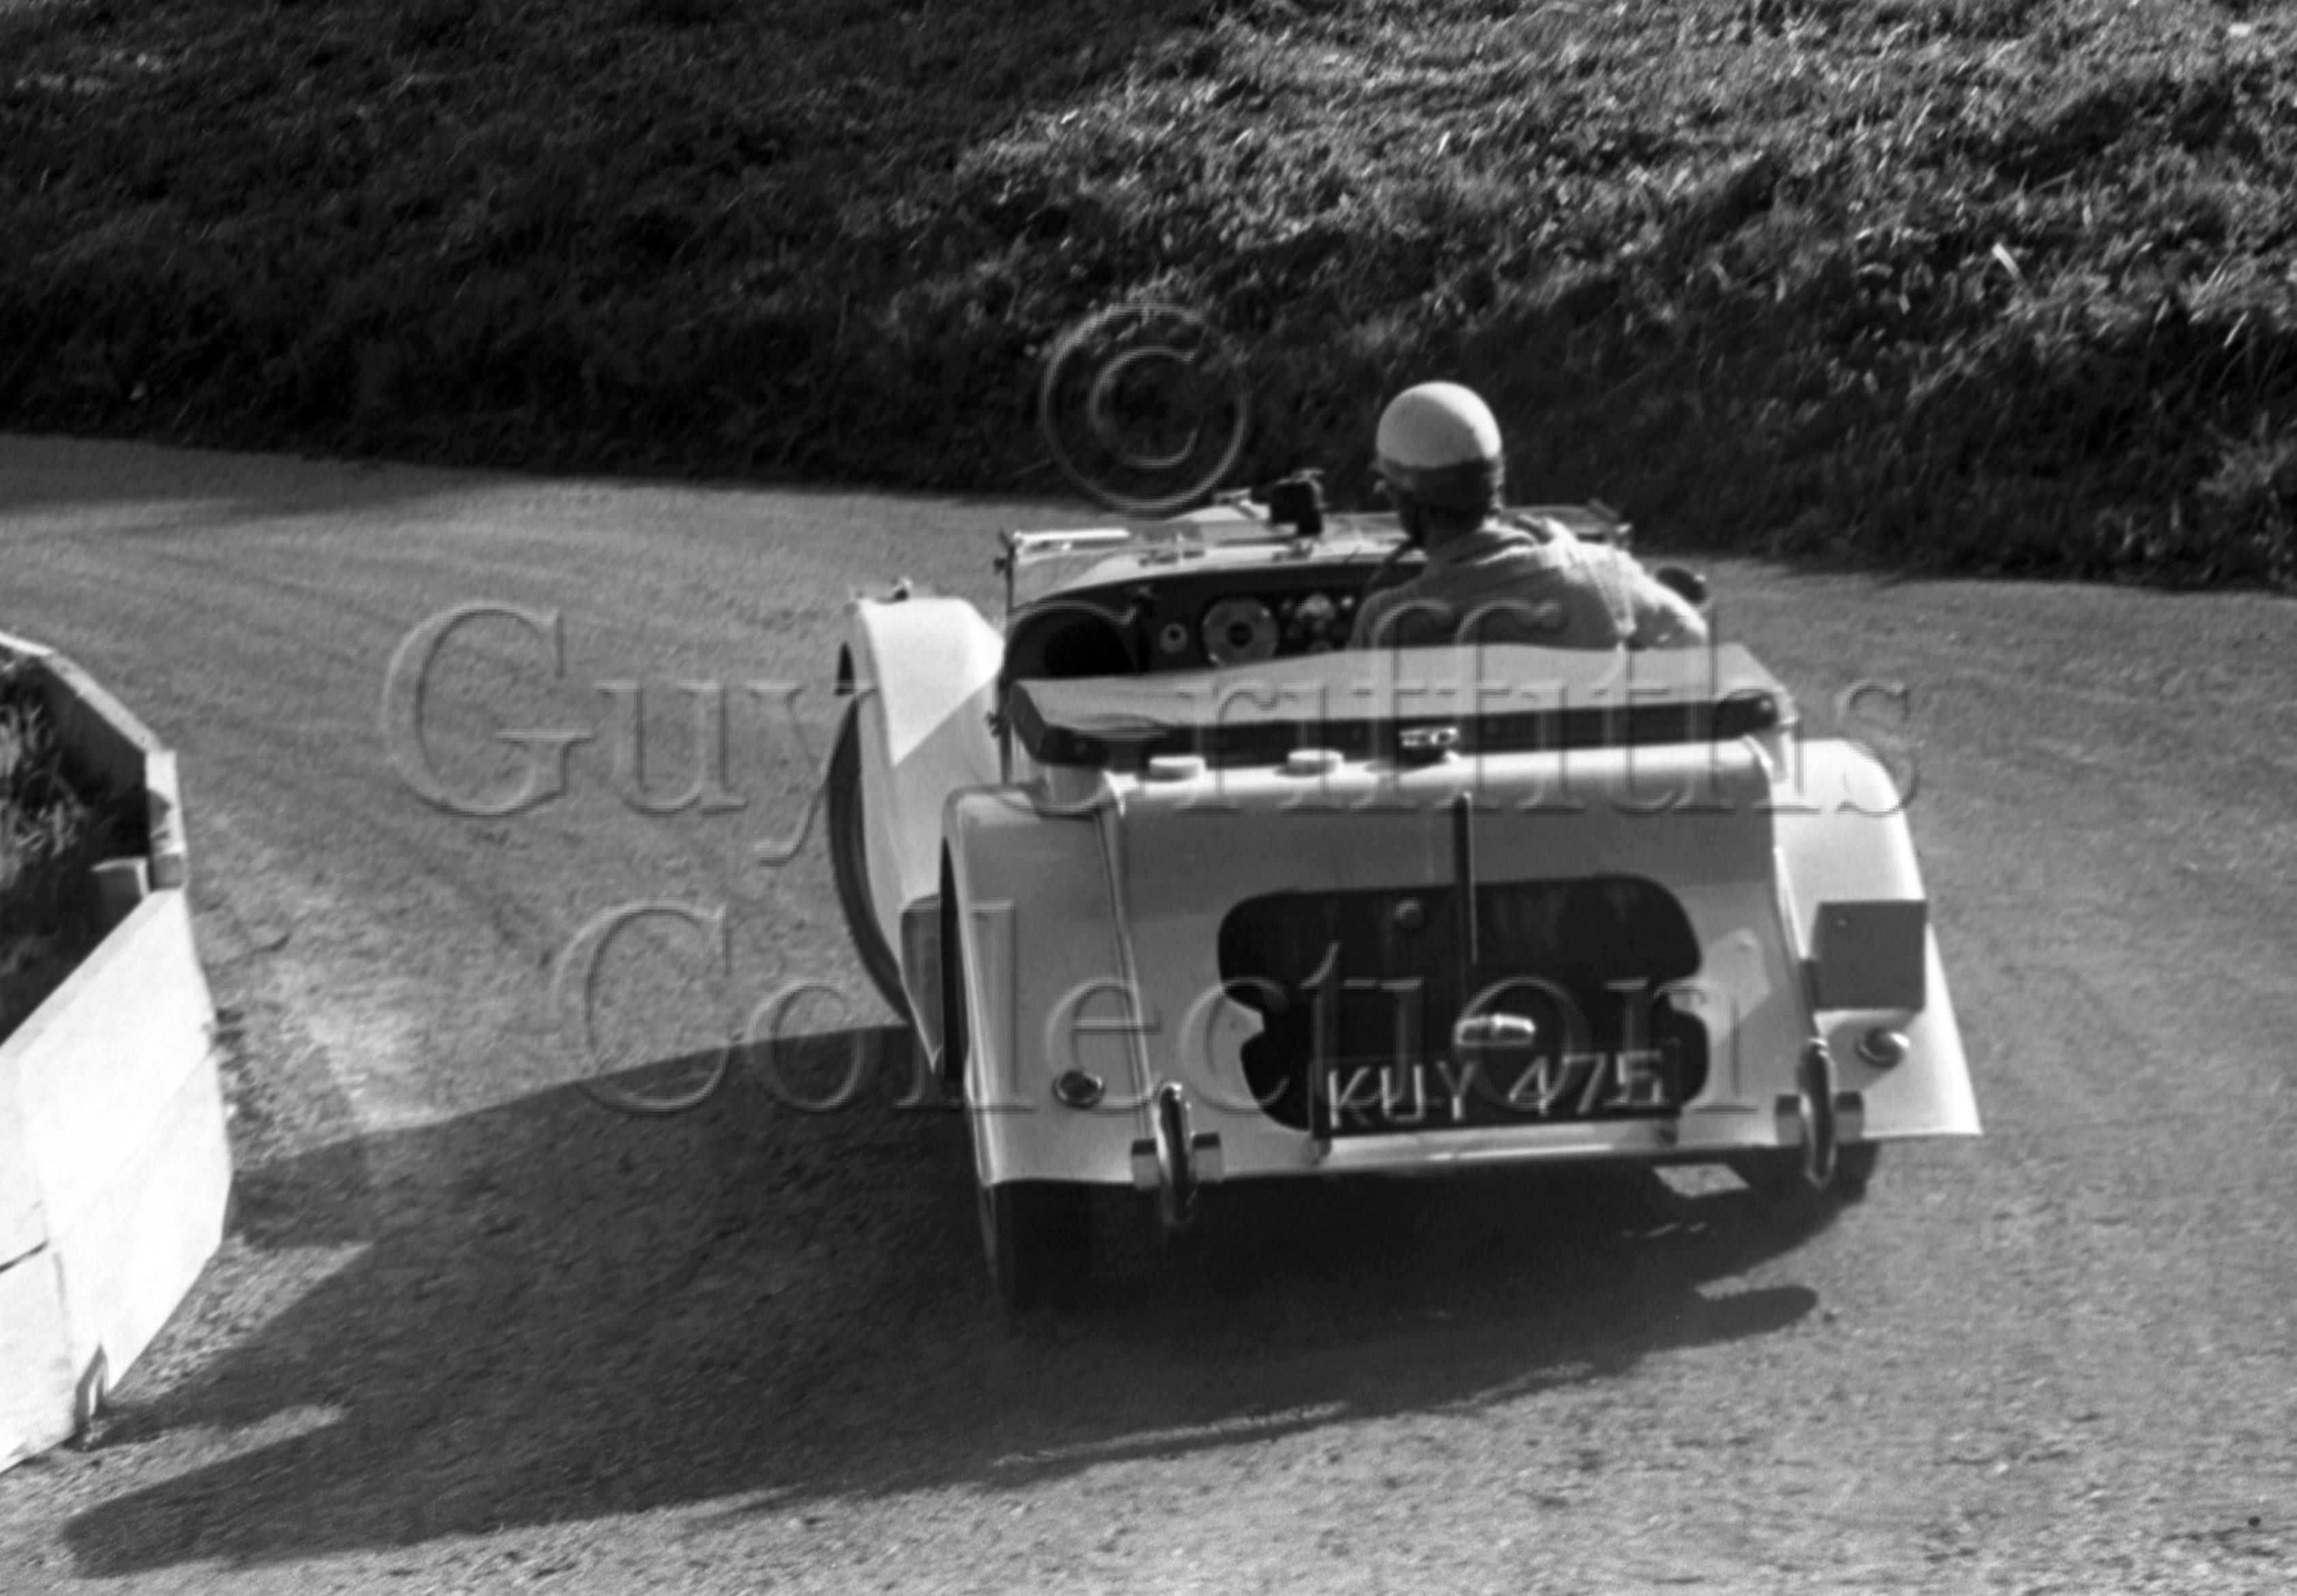 61-433–P-B-Reece–Morgan-Plus-4-KUY-475–Prescott–14-09-1952.jpg - Guy Griffiths Collection